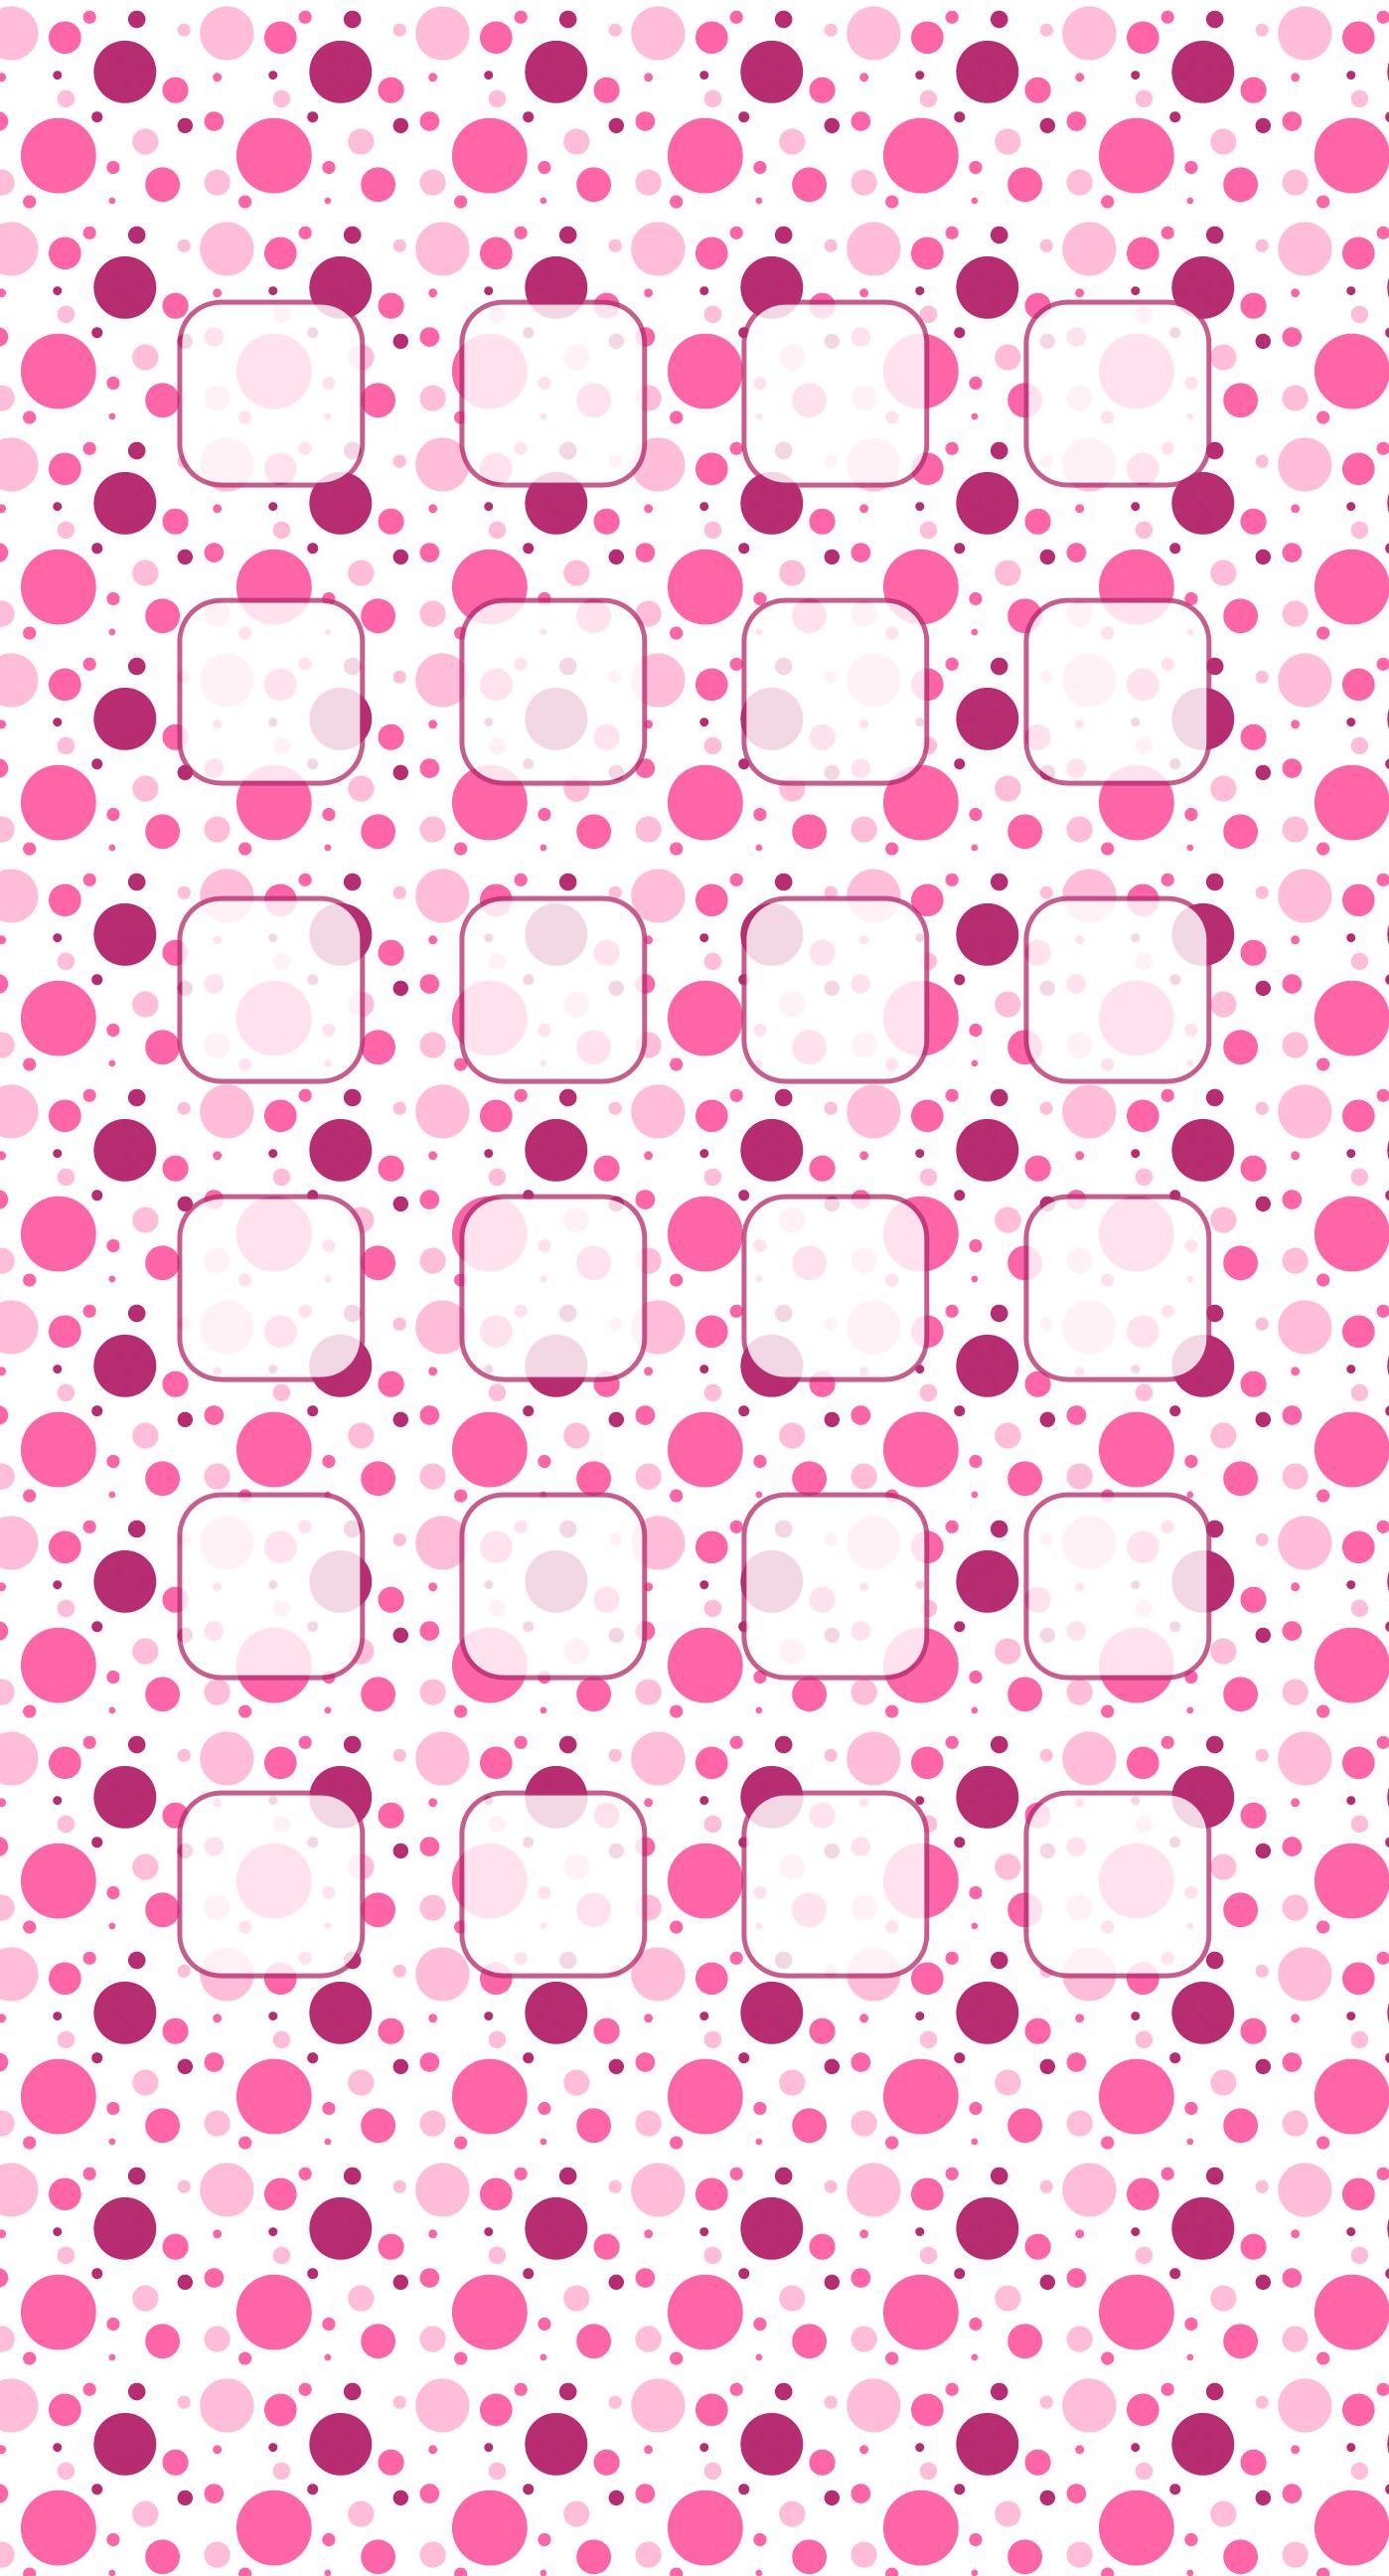 Polka Dot Pattern Pink Purple Shelf Wallpaper Sc Iphone8plus